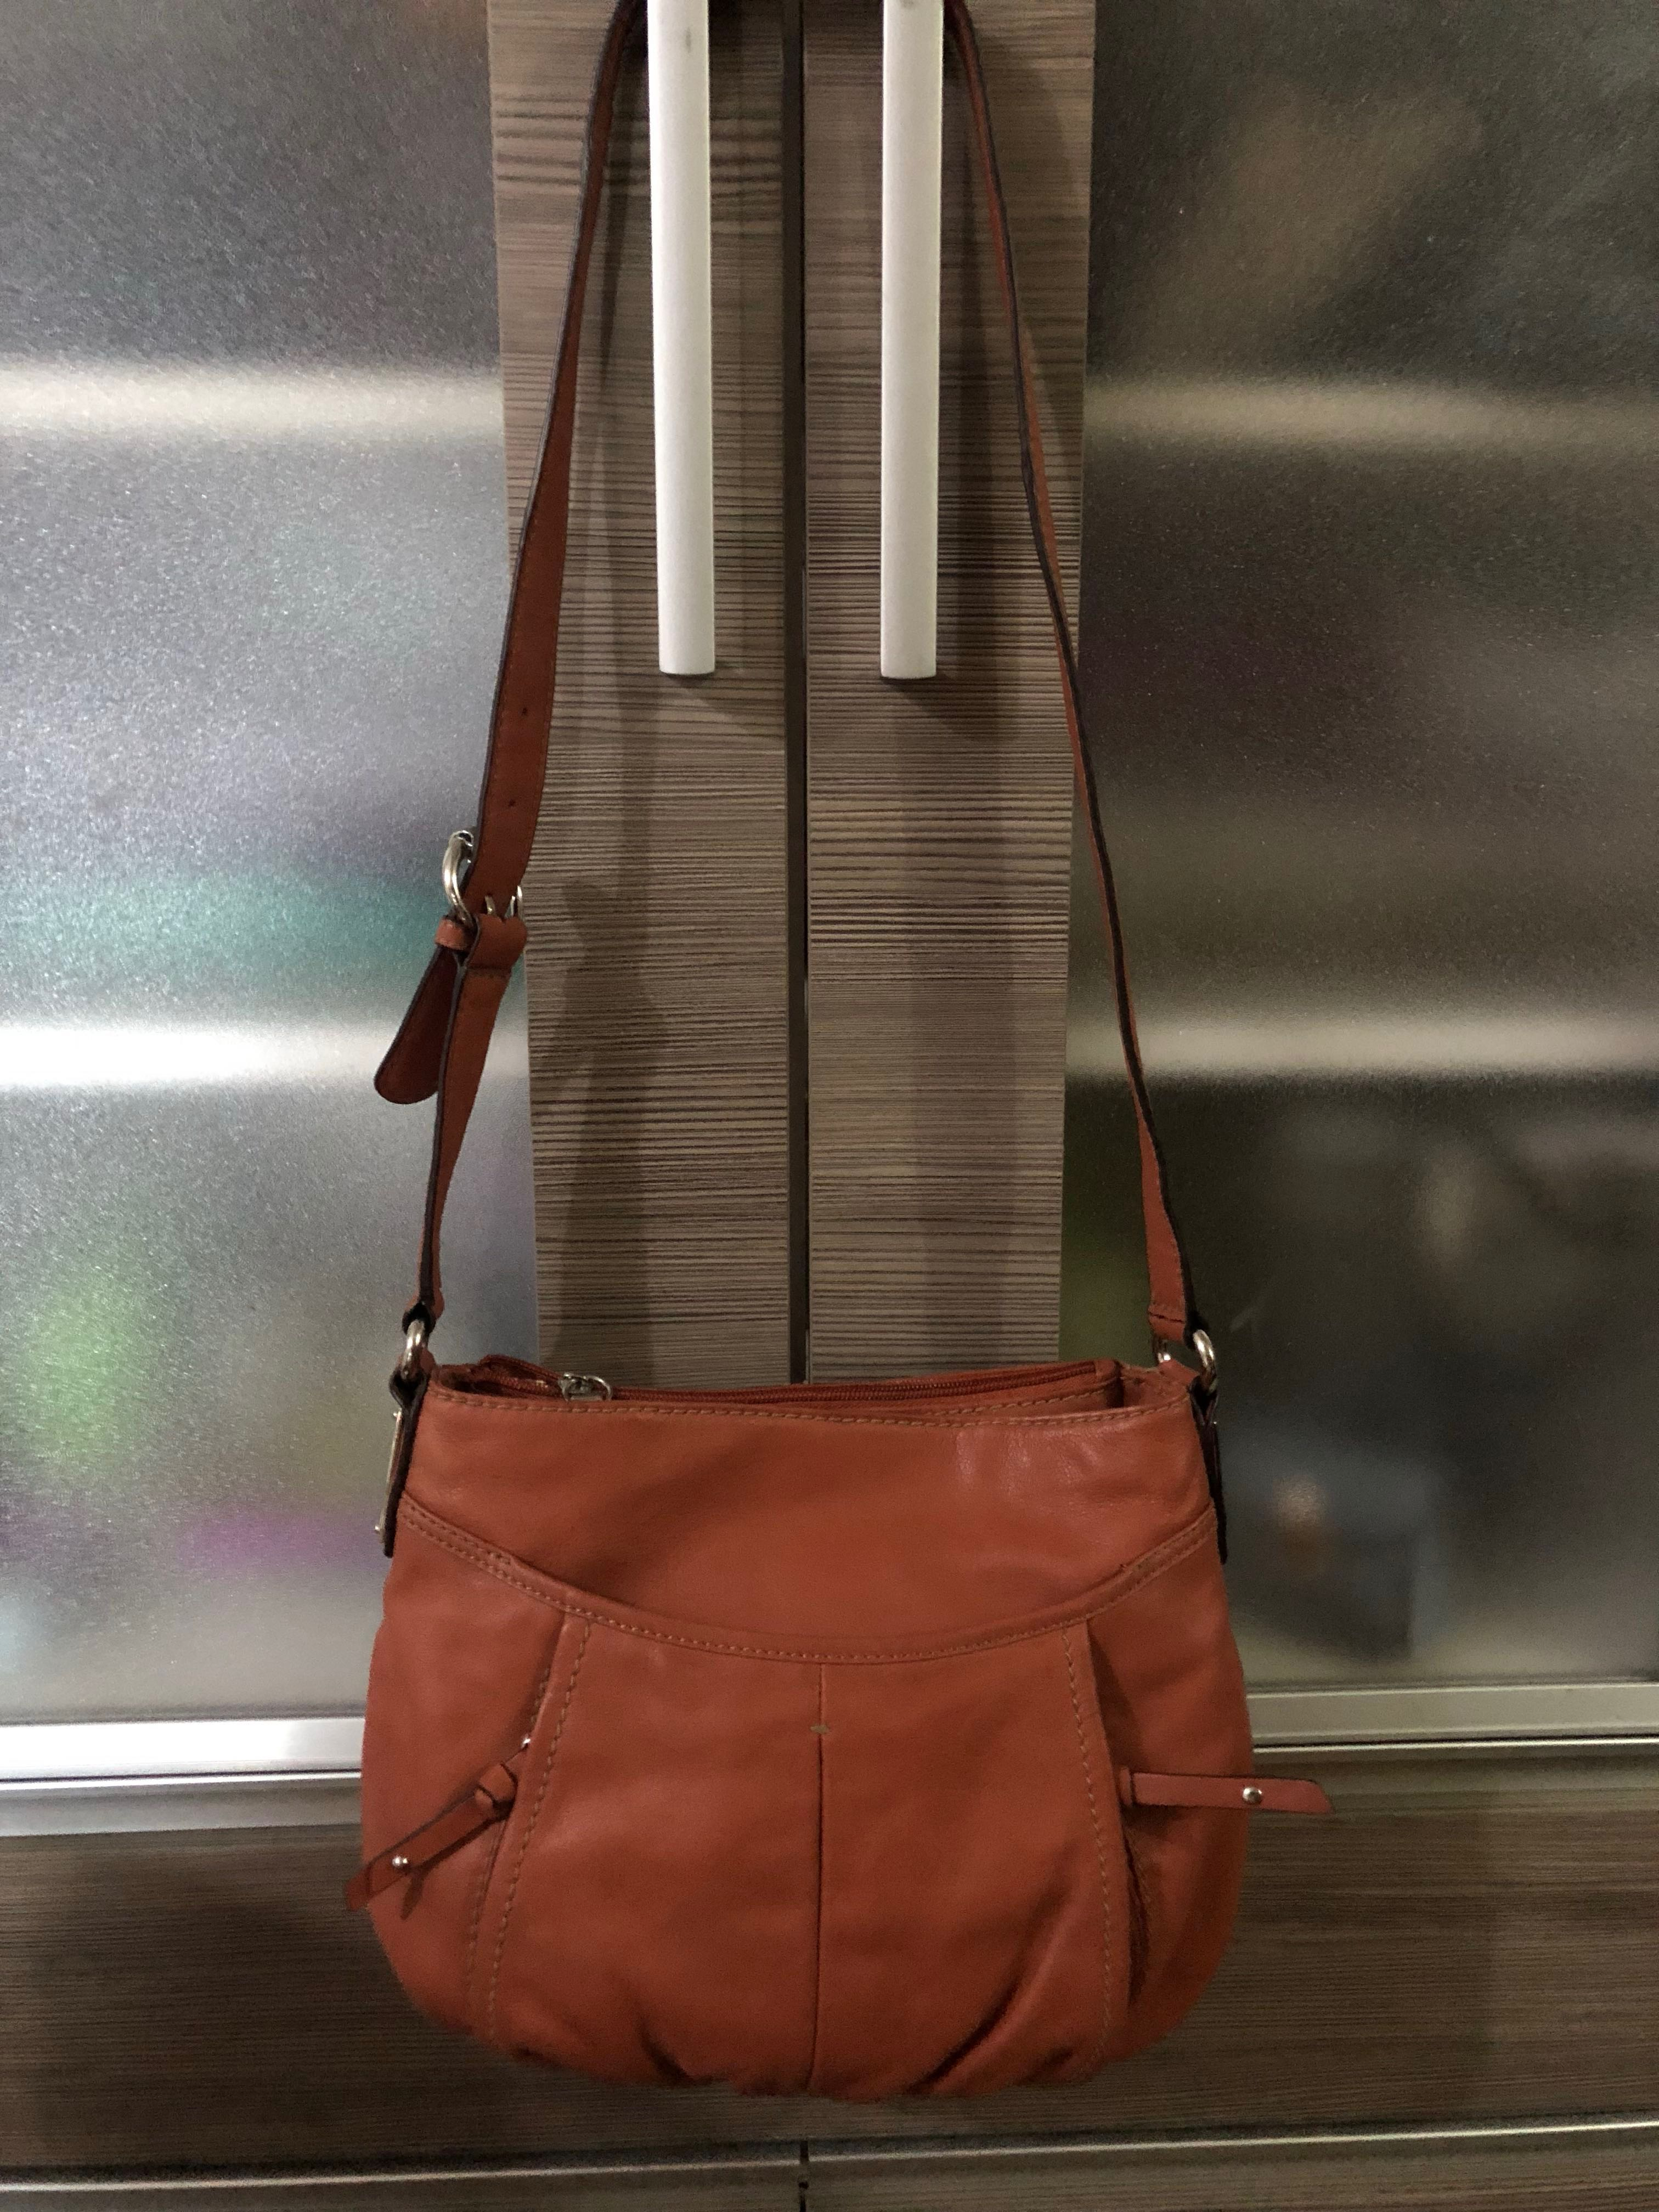 Brandnew Tignanello Leather Crossbody Bag From Canada Preloved Women S Fashion Bags Wallets On Carou